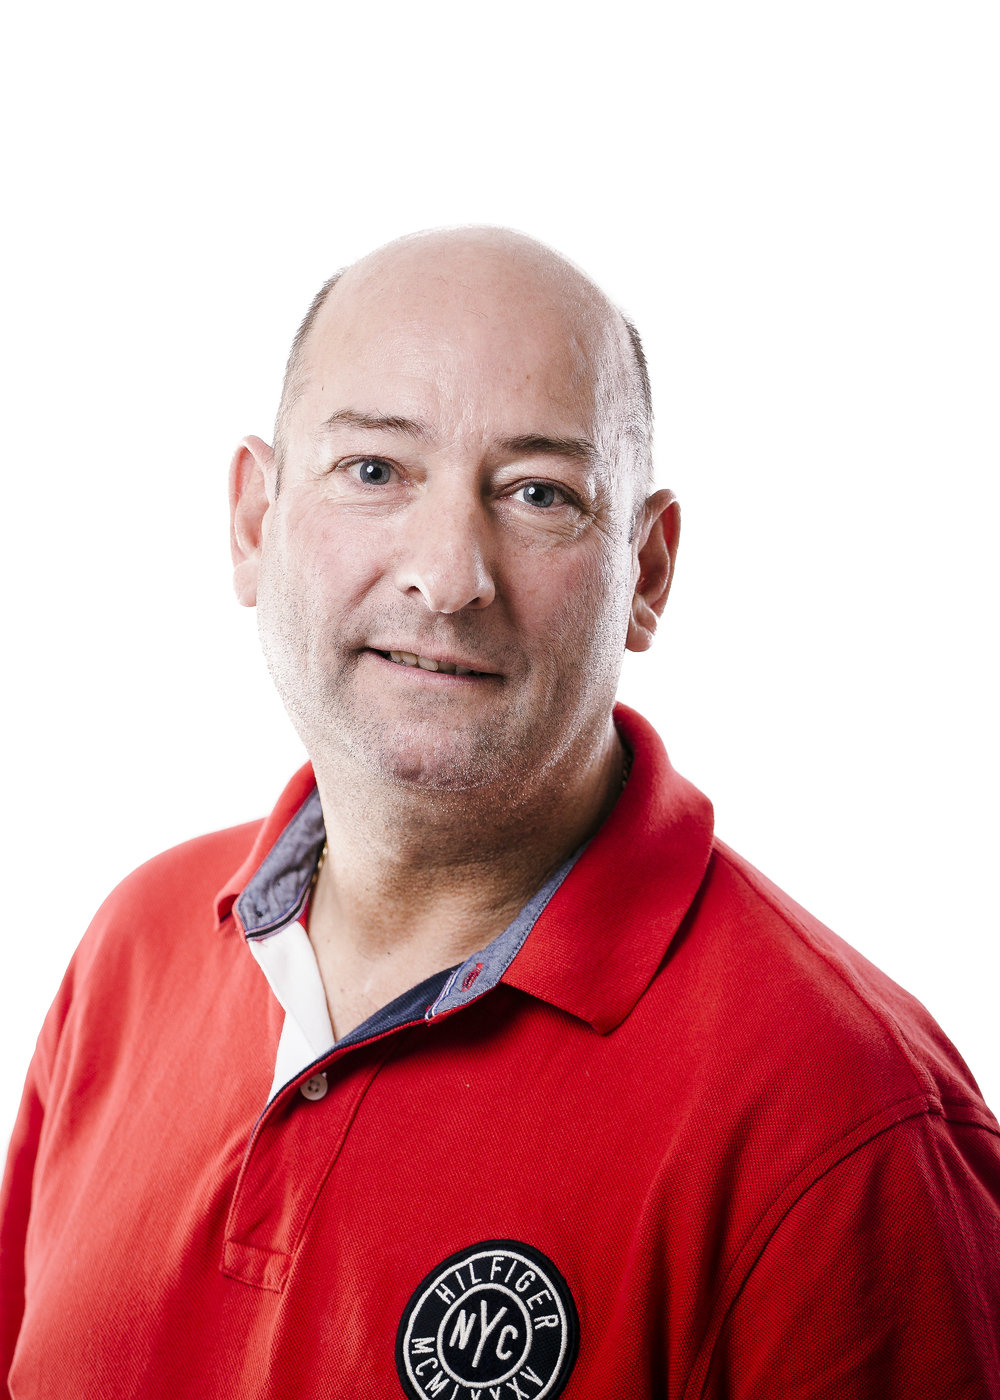 Chris Thompson, Senior Field Technician